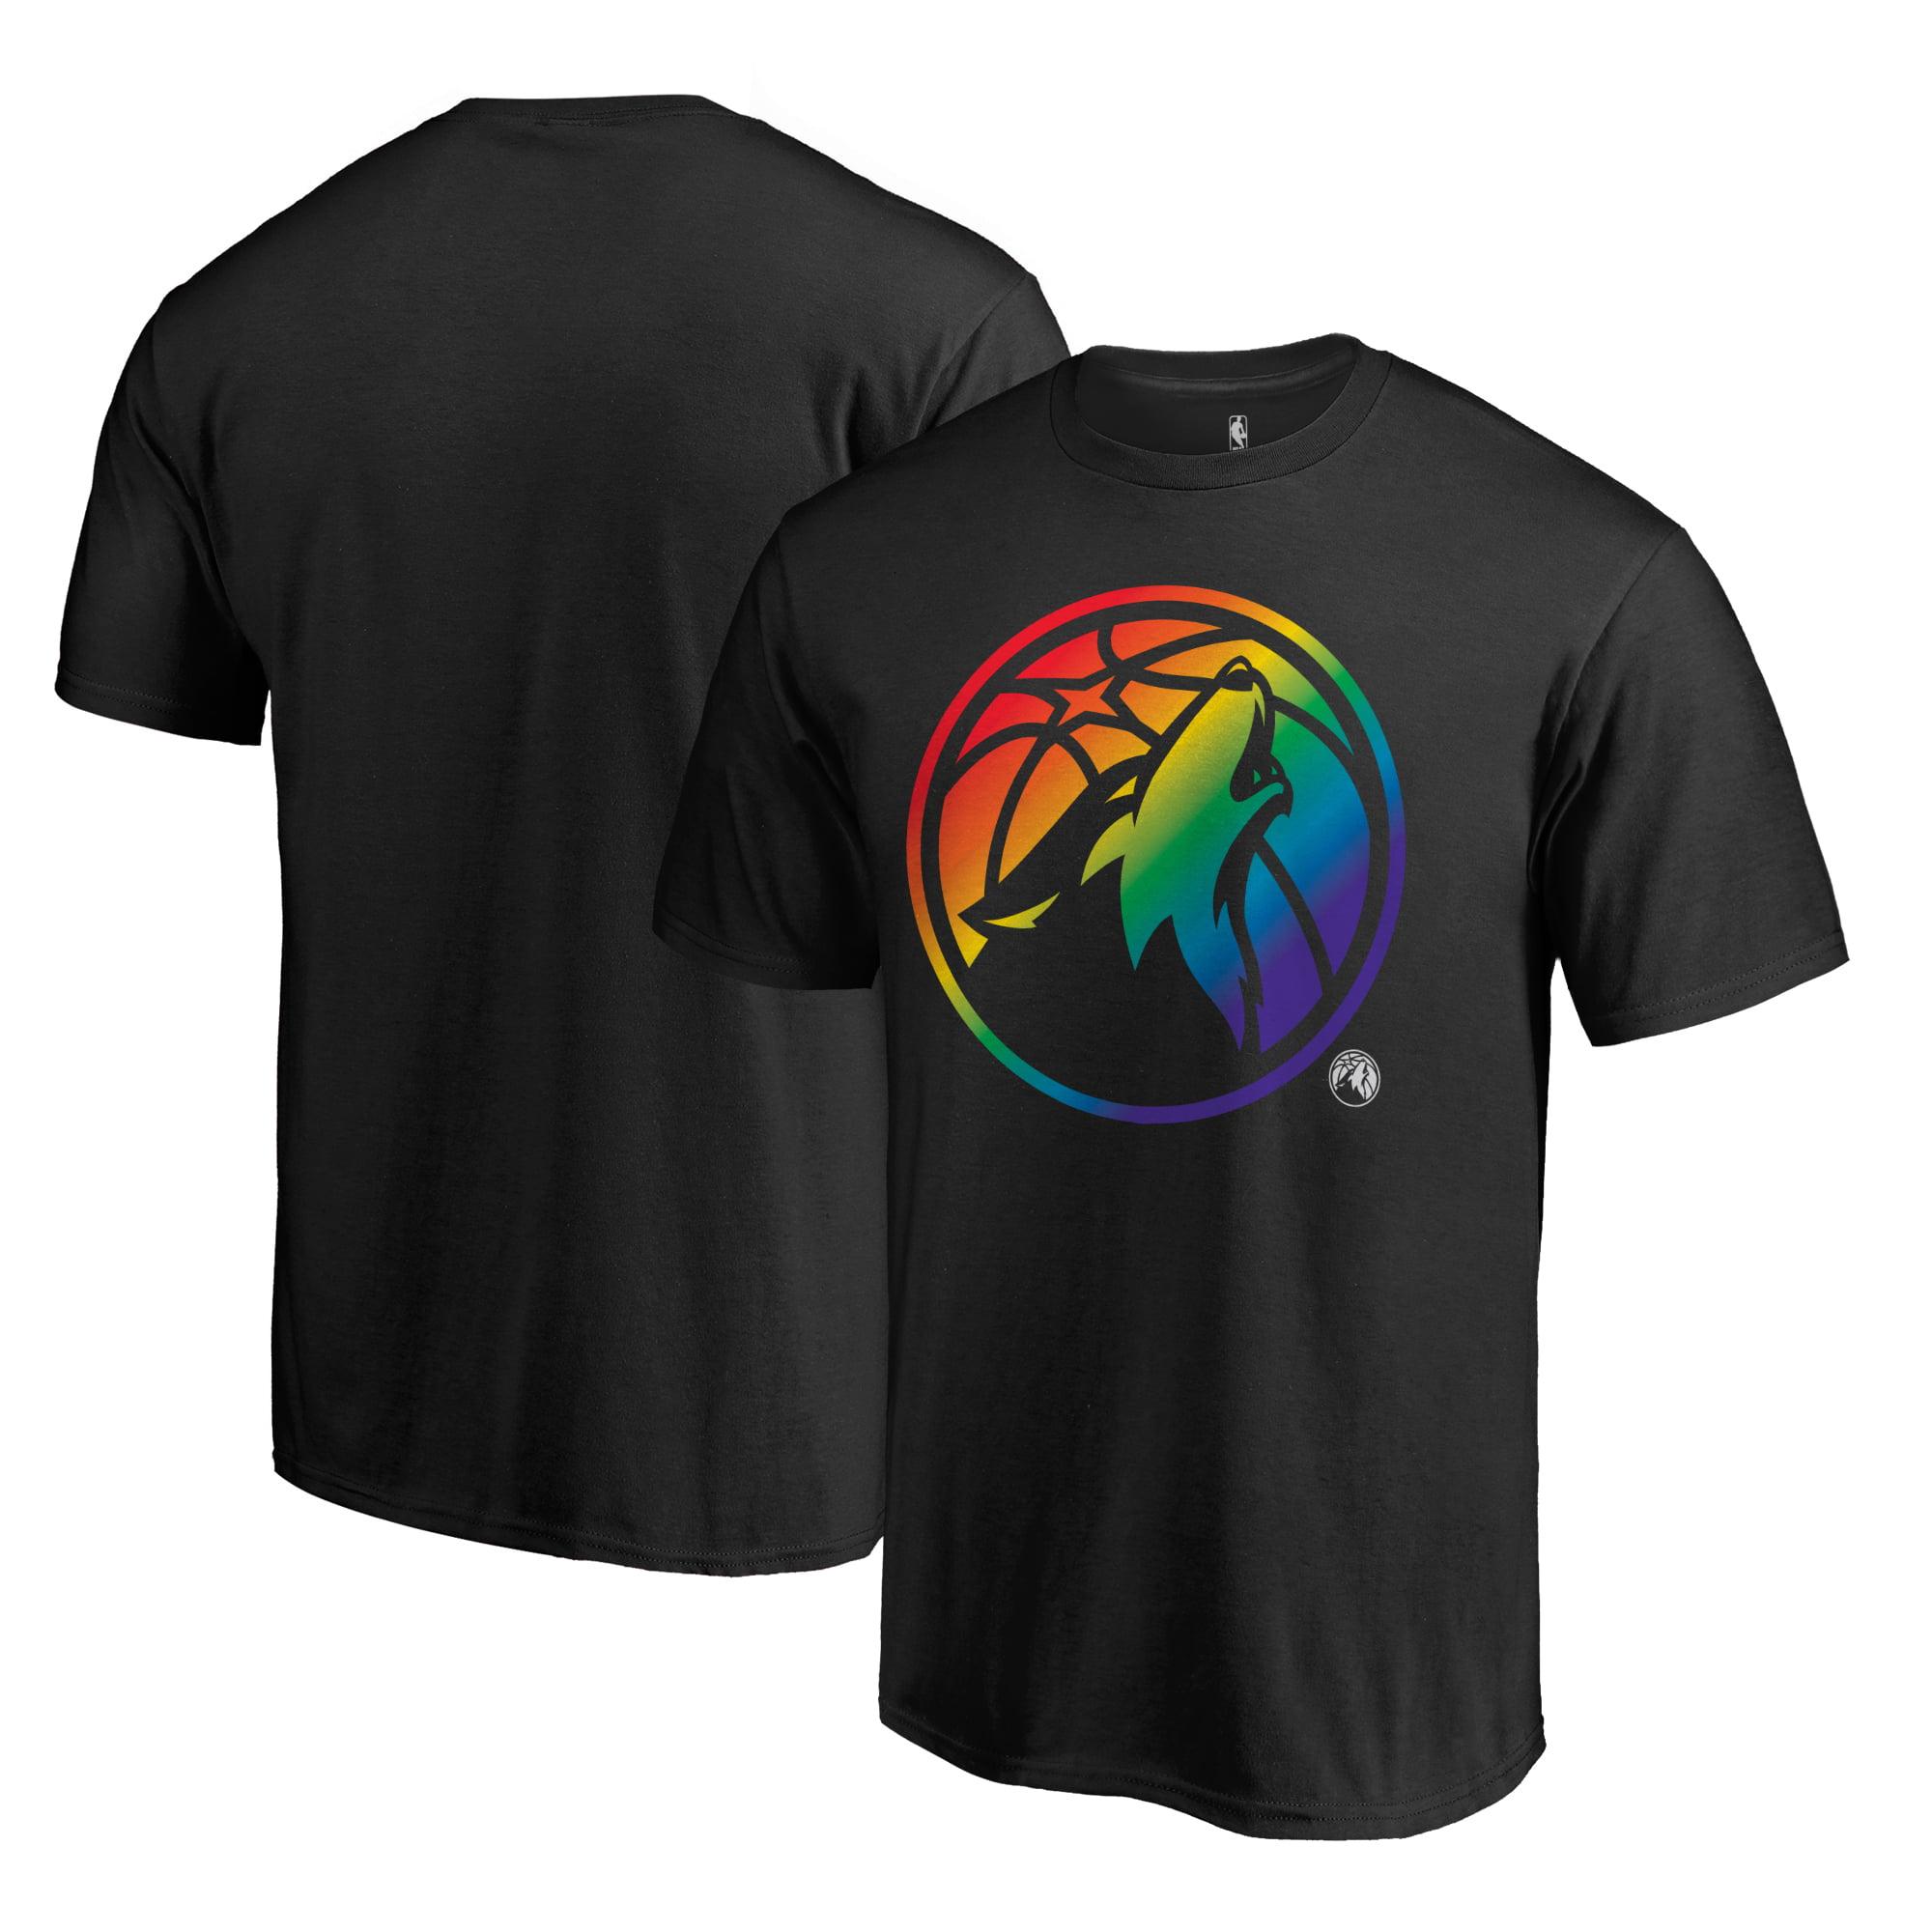 Minnesota Timberwolves Fanatics Branded Team Pride T-Shirt - Black